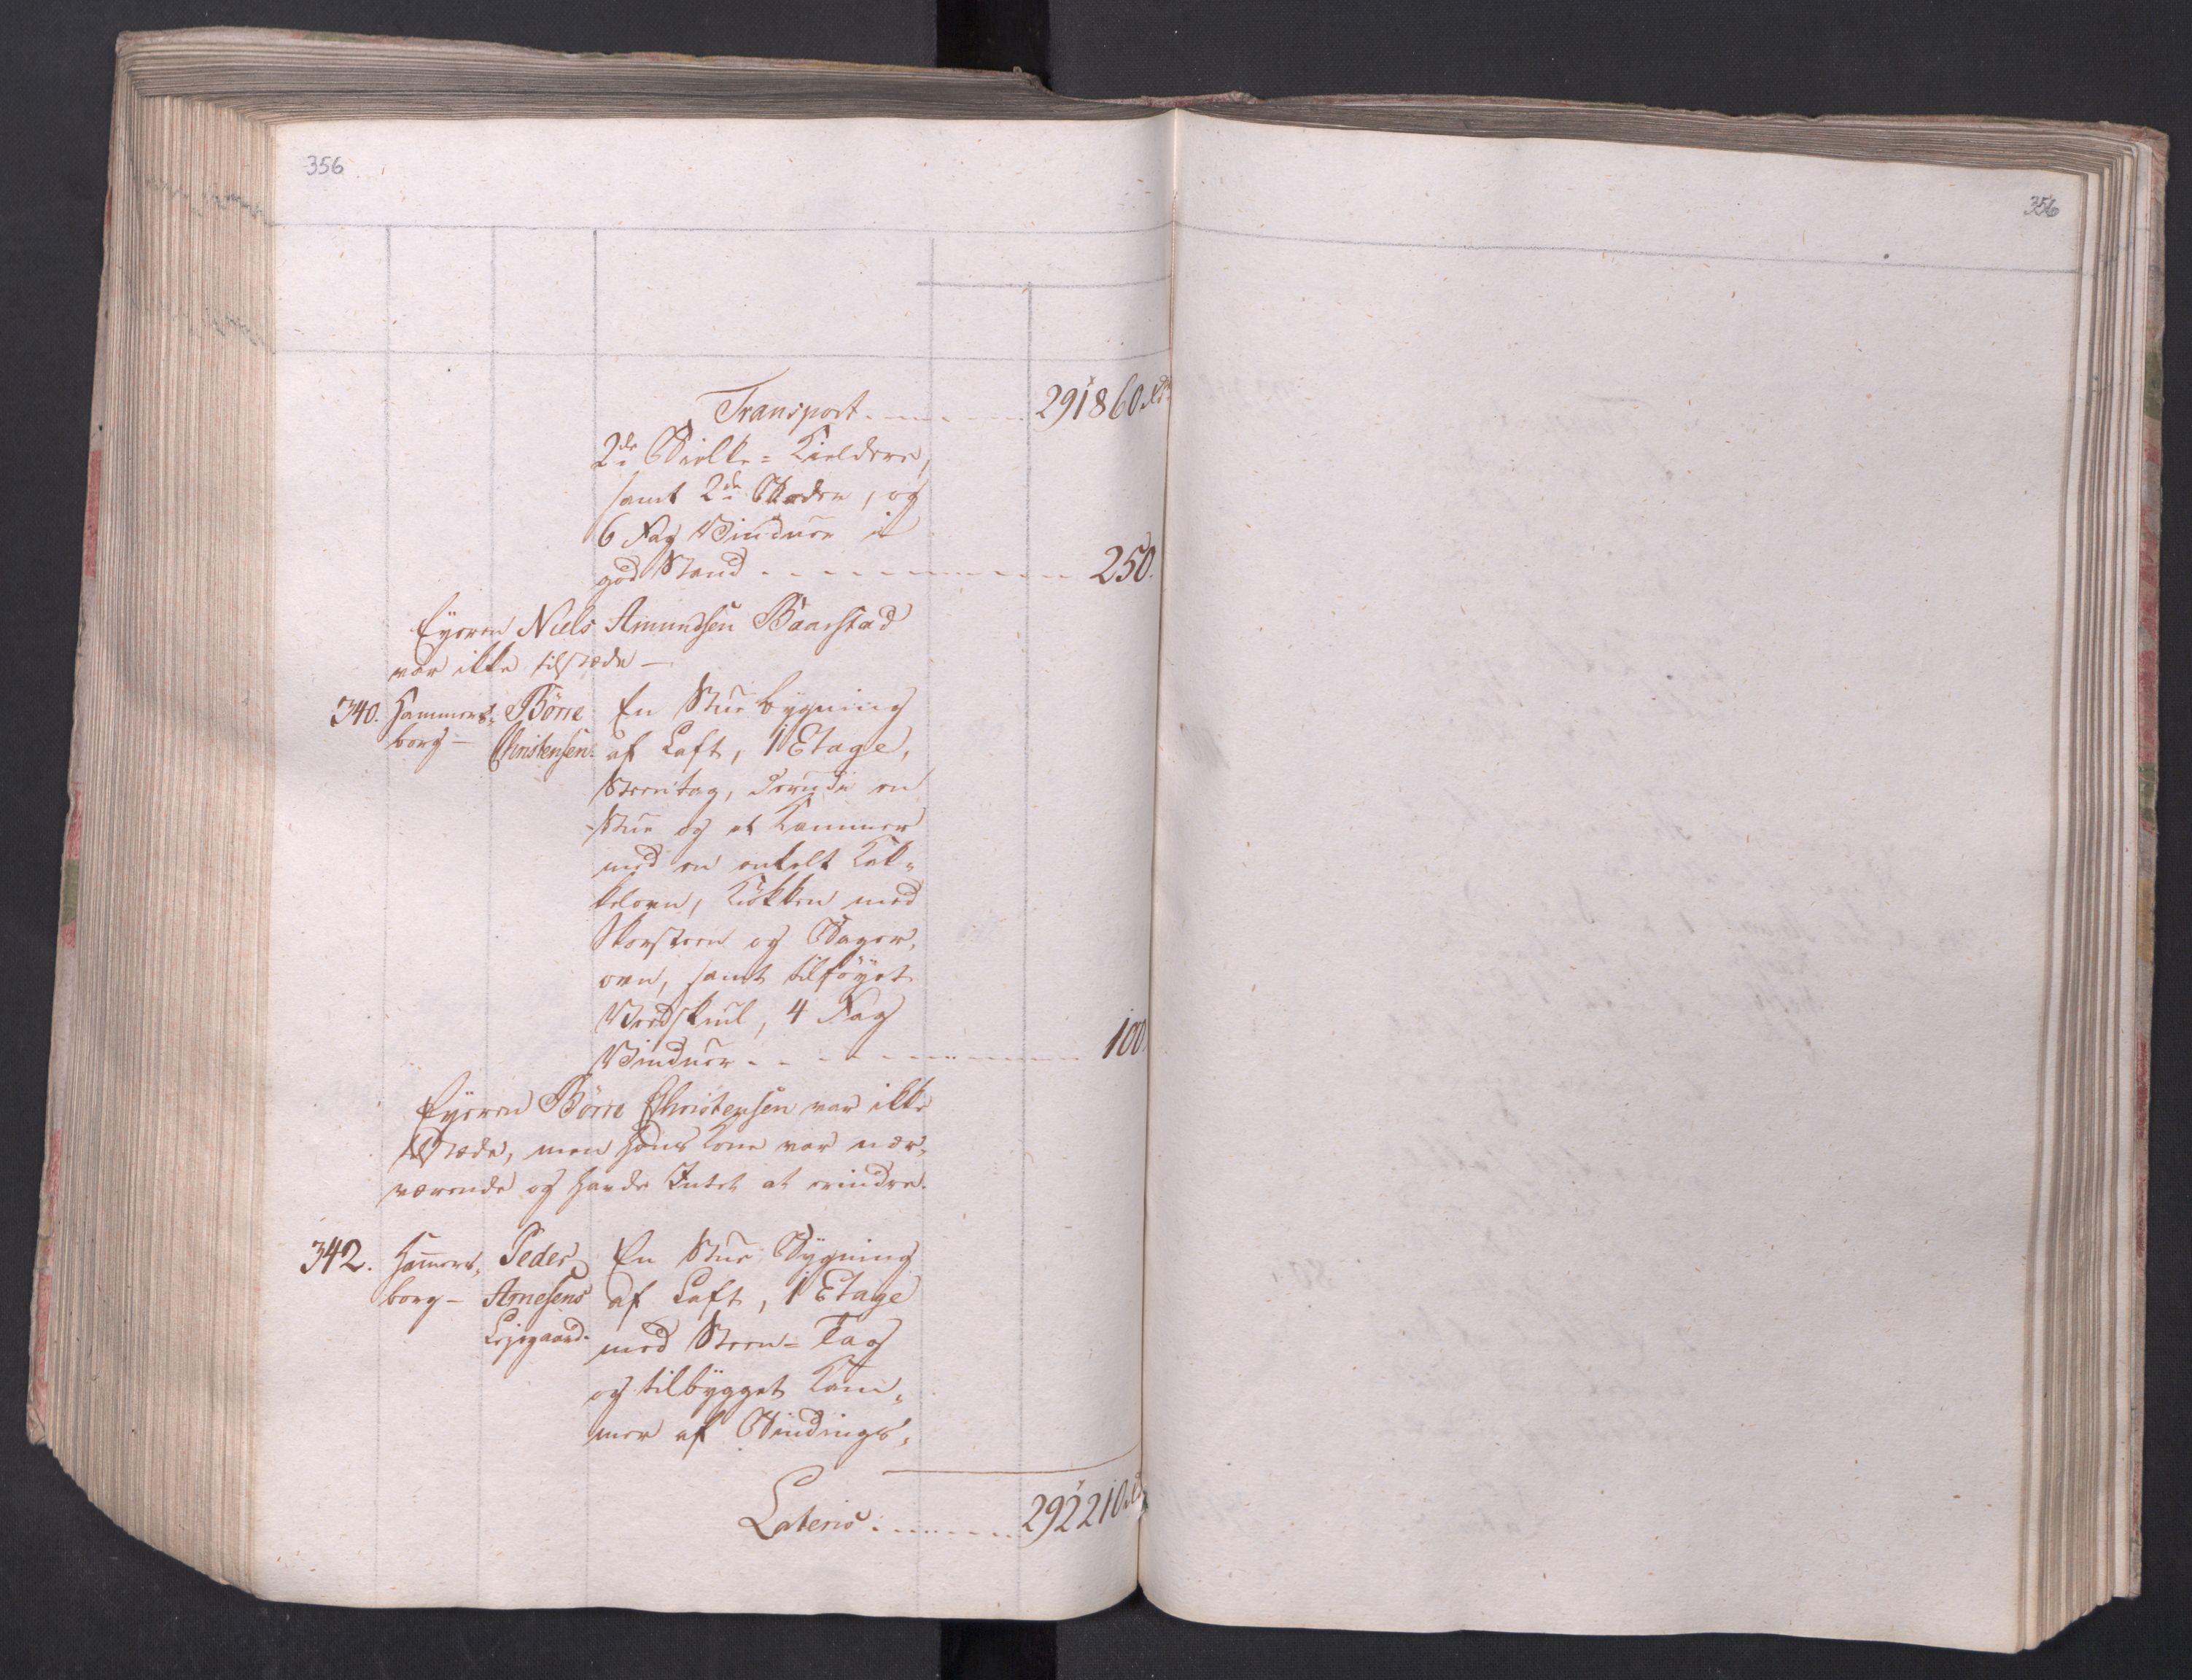 SAO, Kristiania stiftamt, I/Ia/L0015: Branntakster, 1797, s. 356